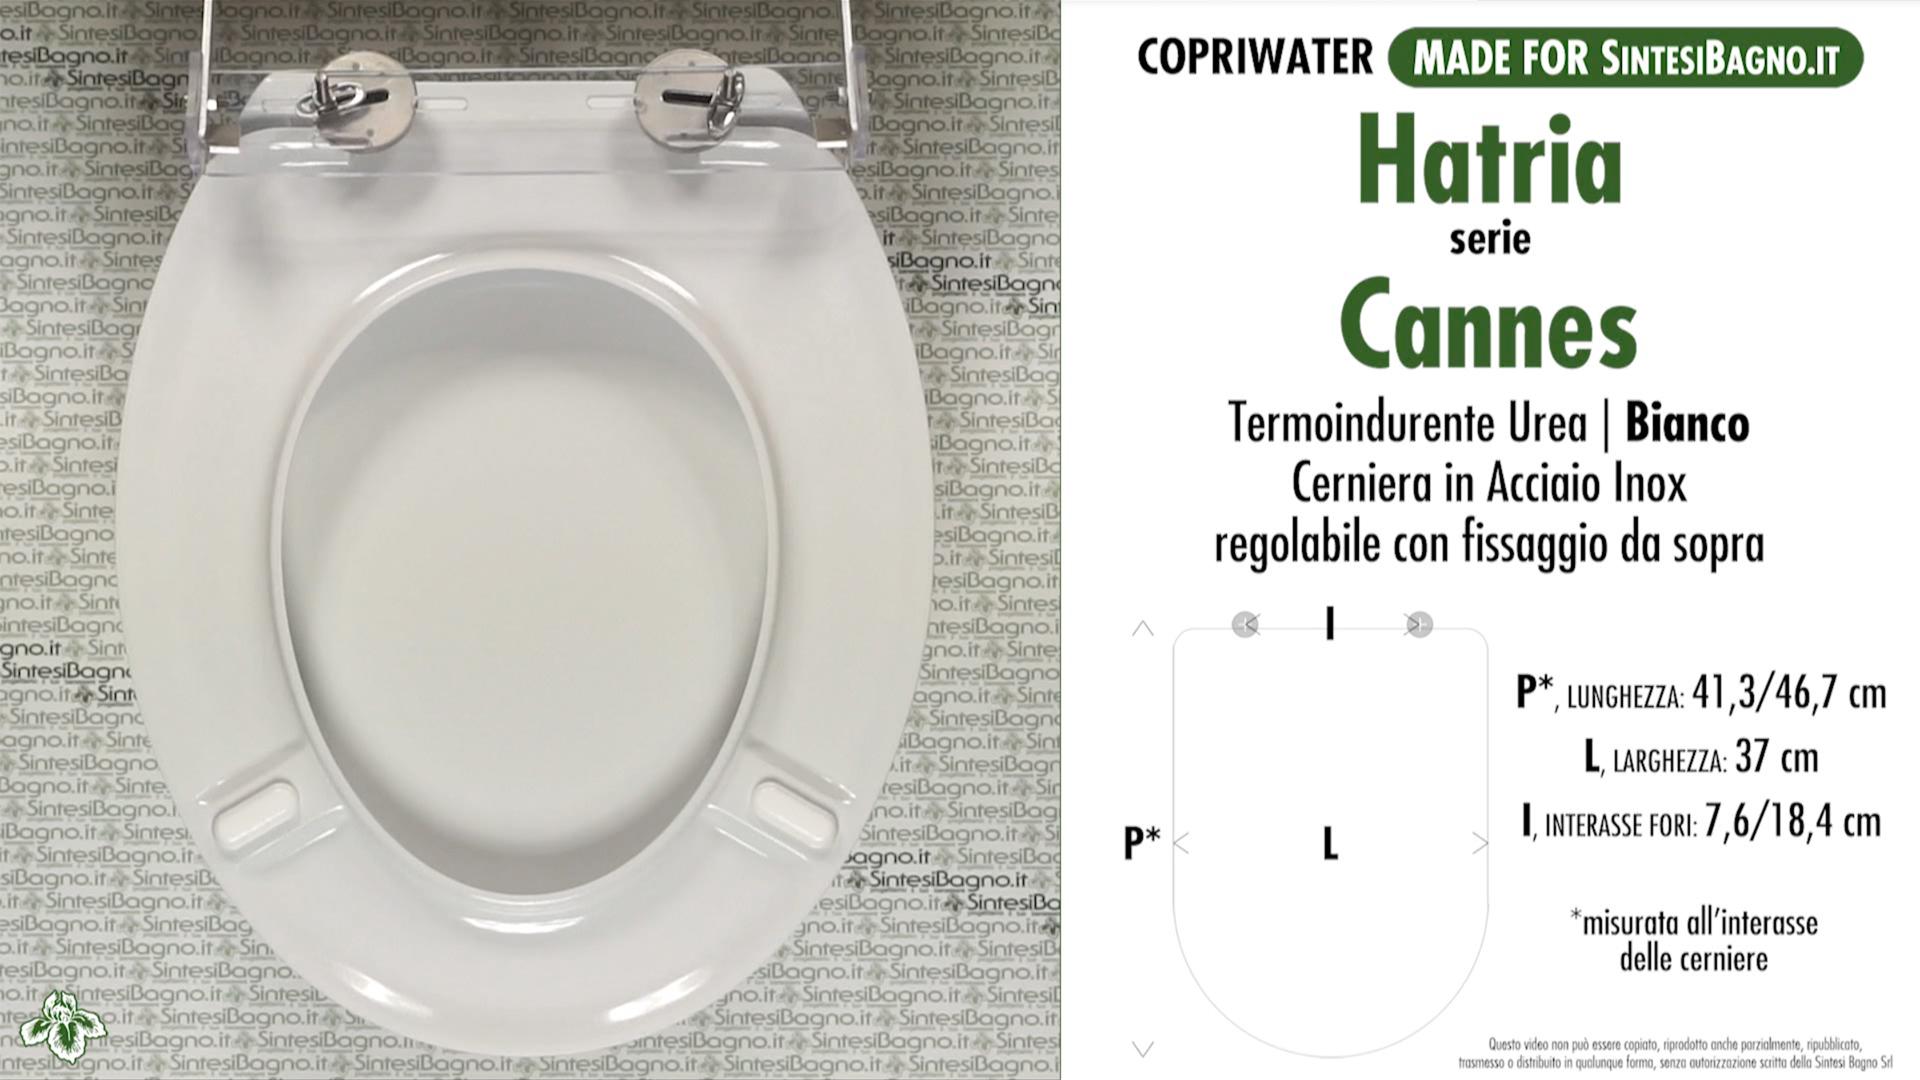 SCHEDA TECNICA MISURE copriwater HATRIA CANNES